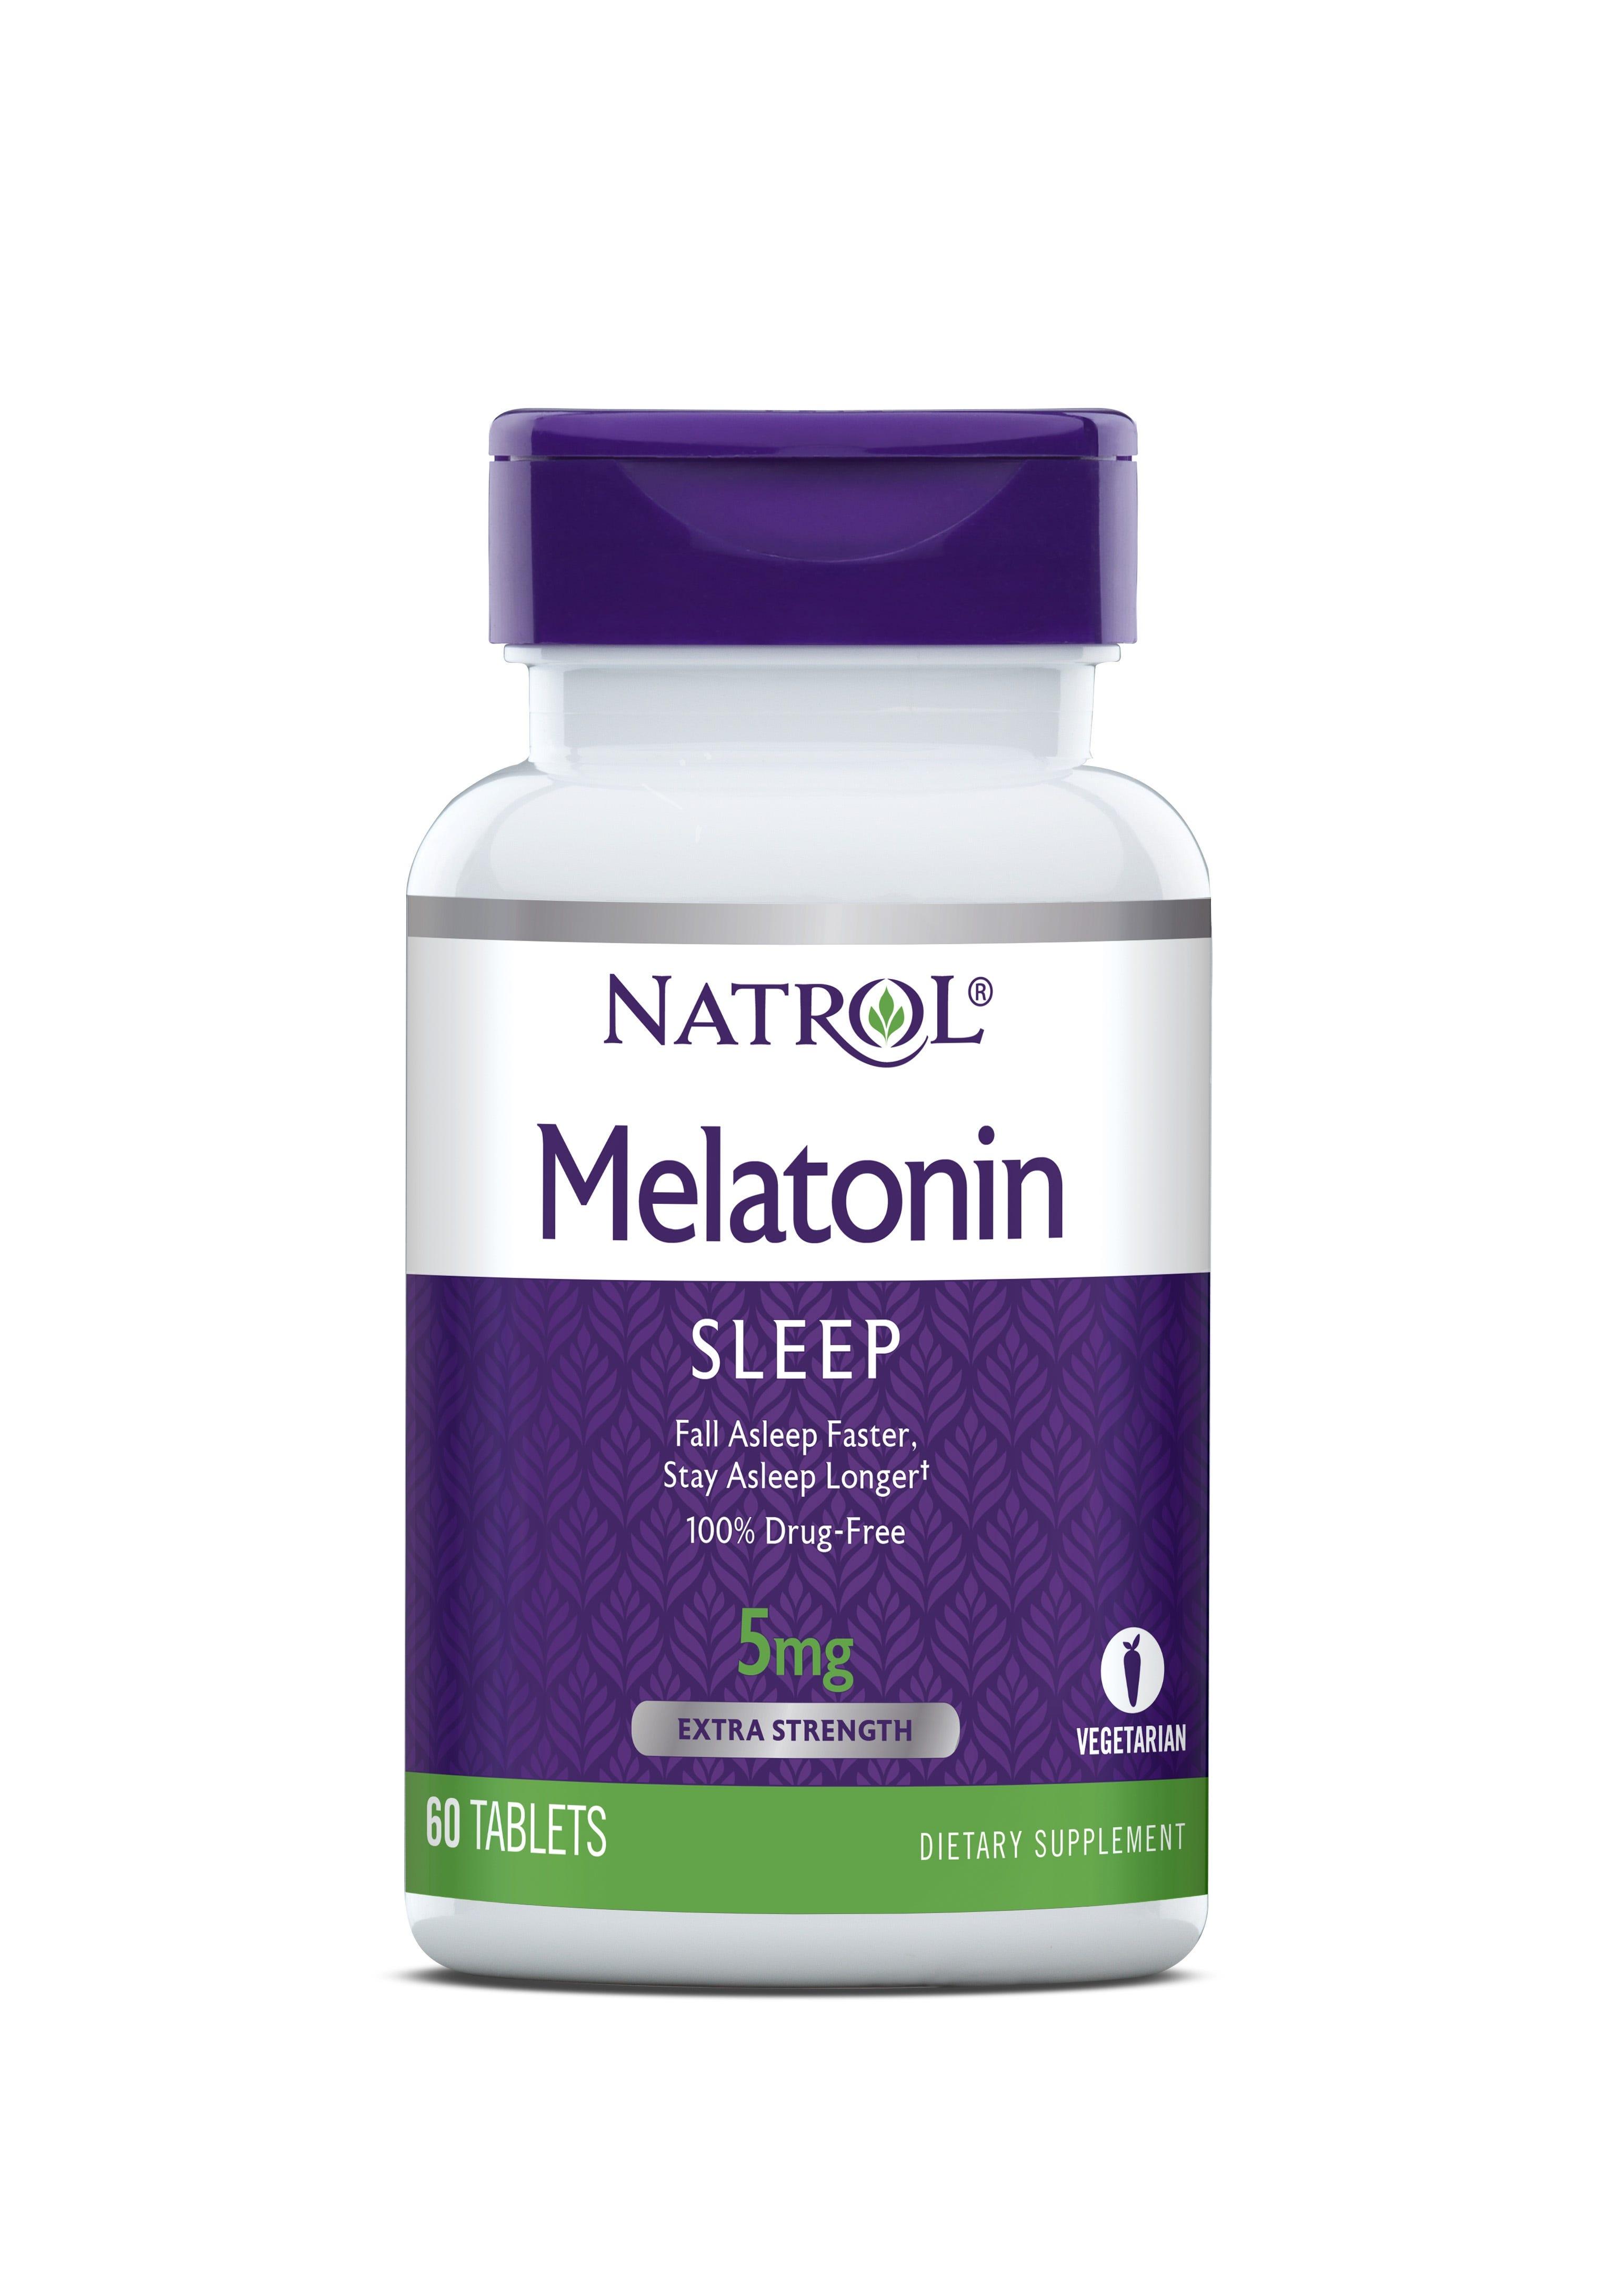 Image of Natrol Melatonin Sleep Tablets, 5mg - 60 ct